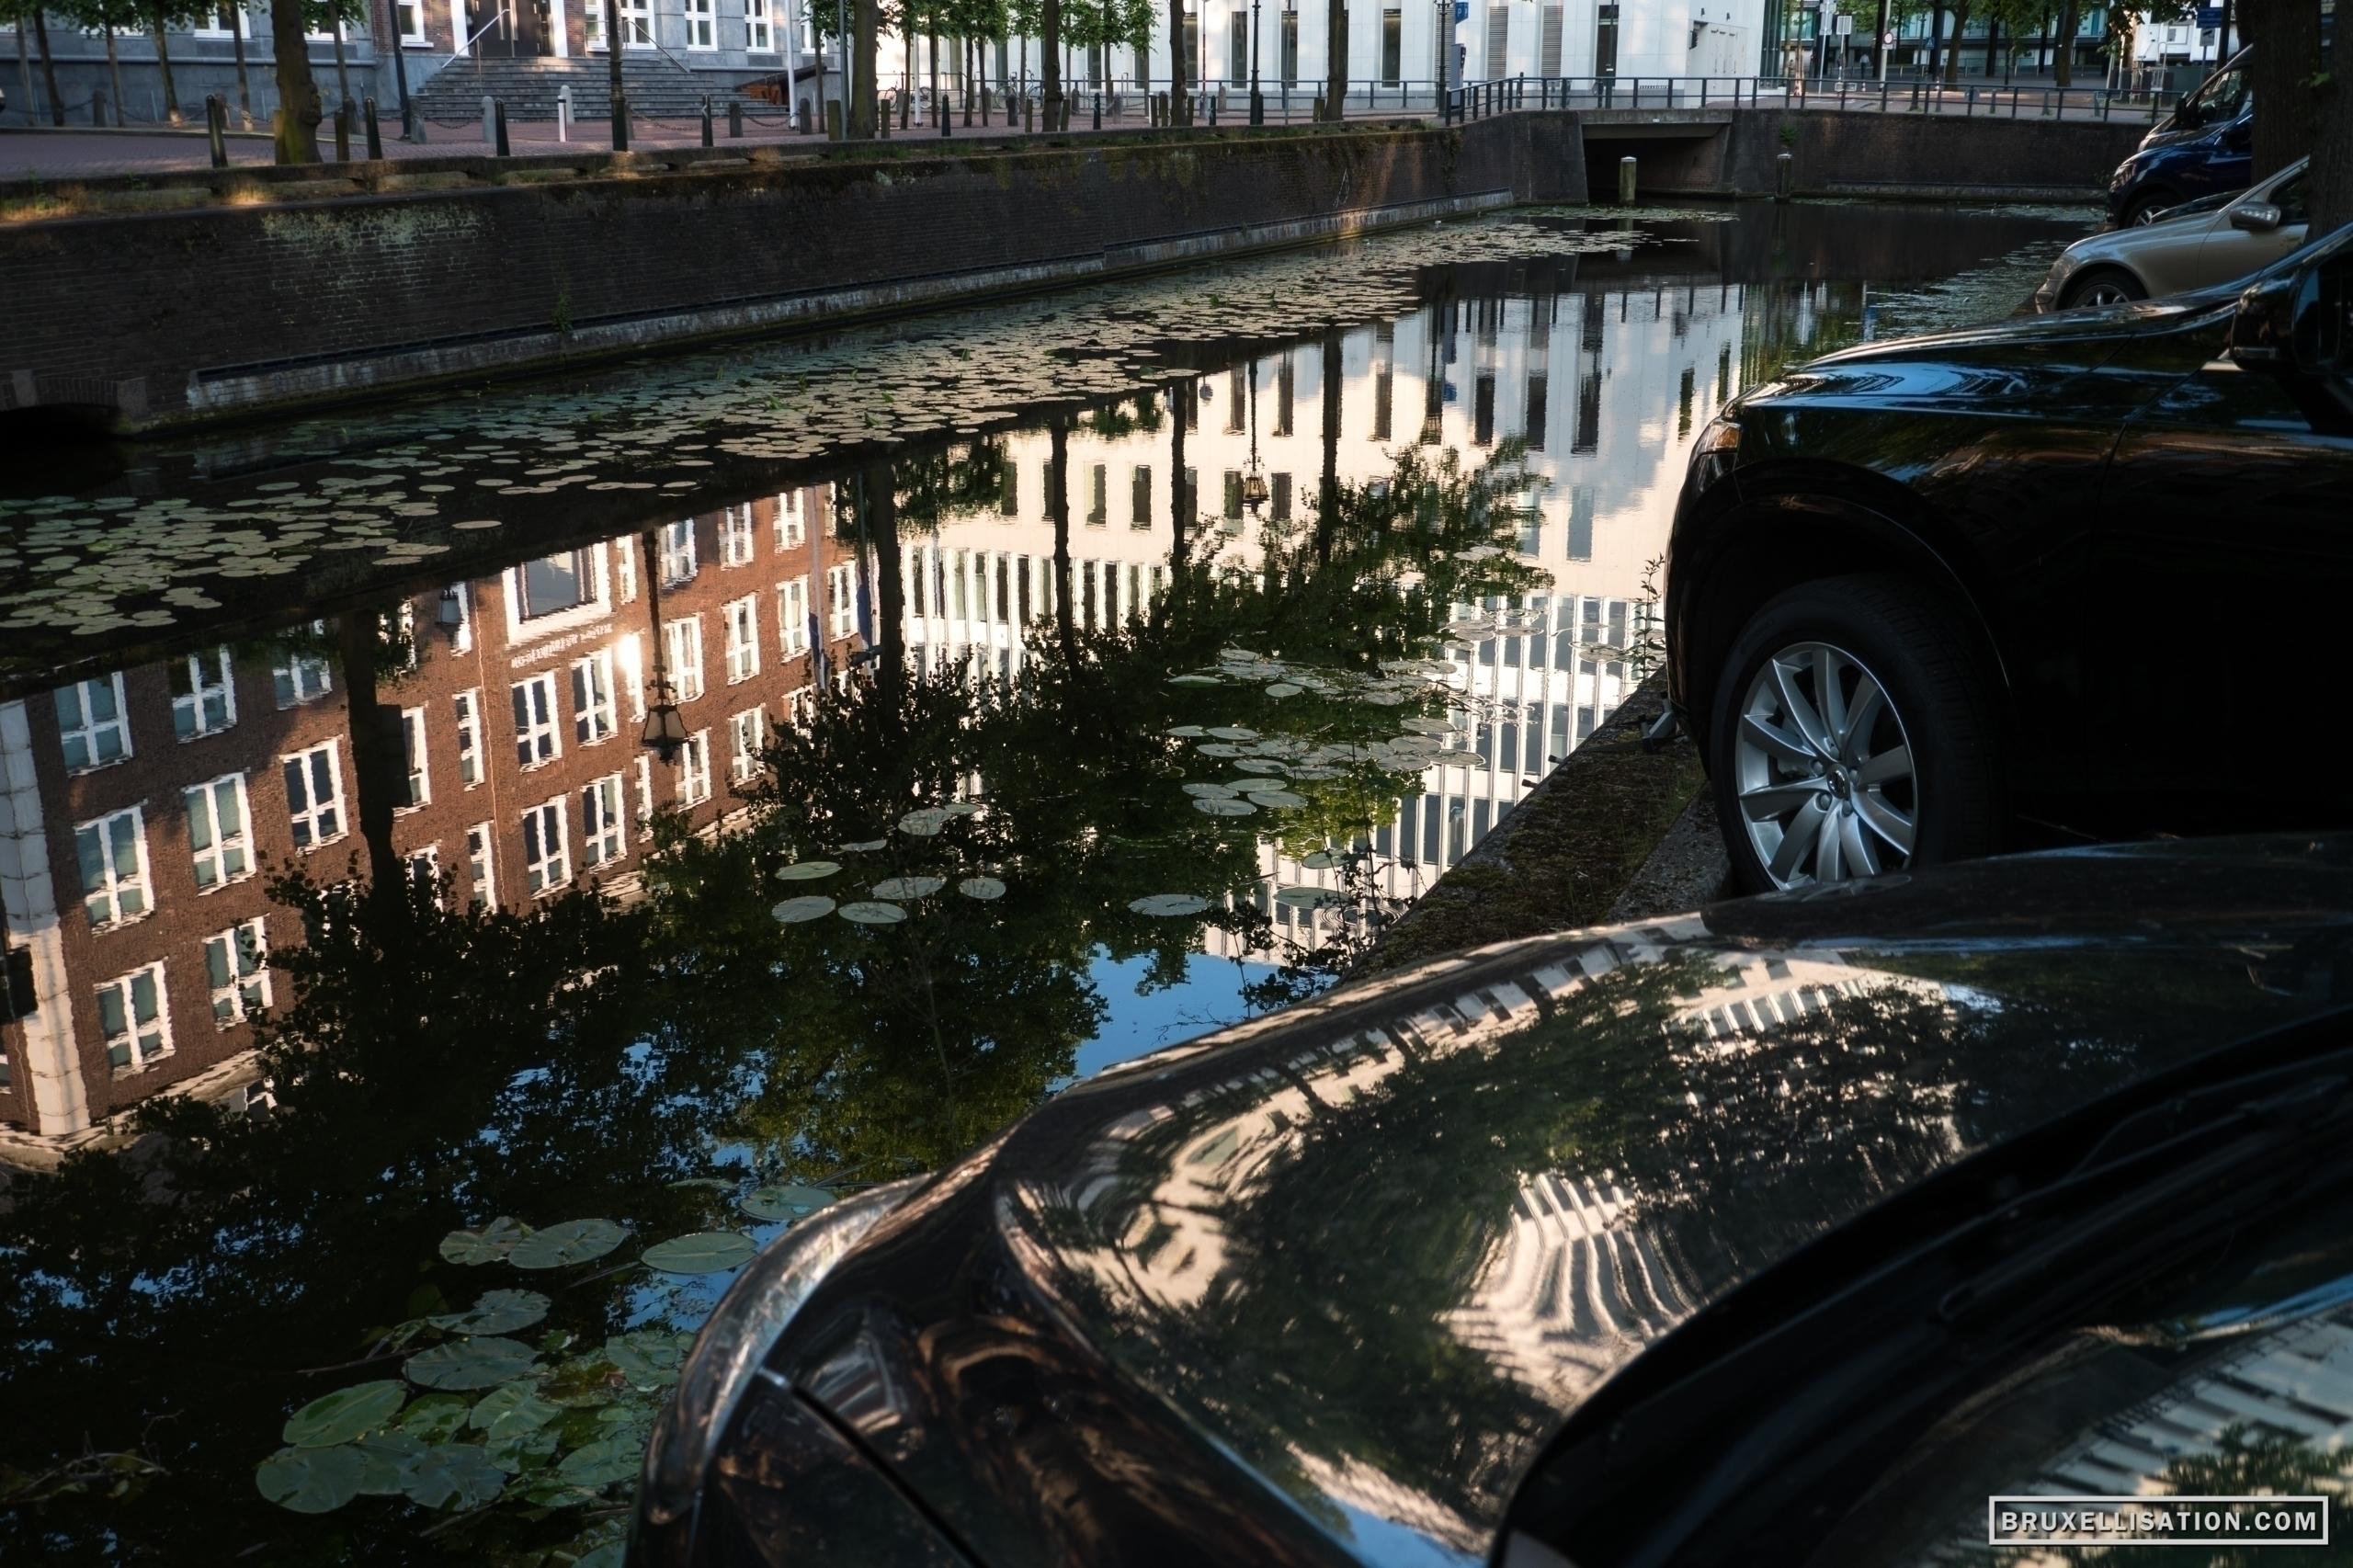 Netherlands, Den Haag, June 201 - bruxellisation | ello